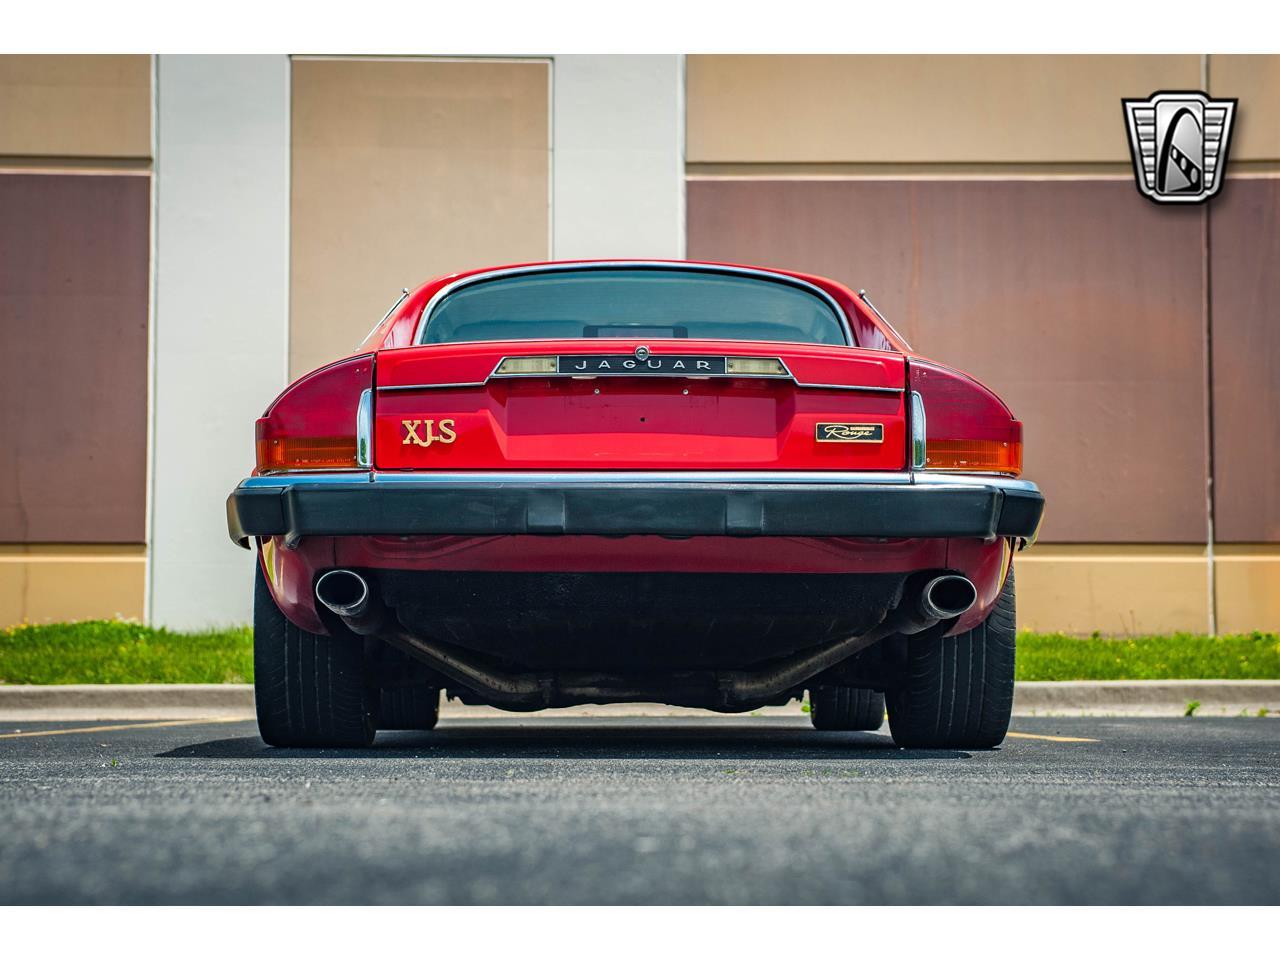 Large Picture of '89 Jaguar XJS located in O'Fallon Illinois - $20,000.00 - QB9L